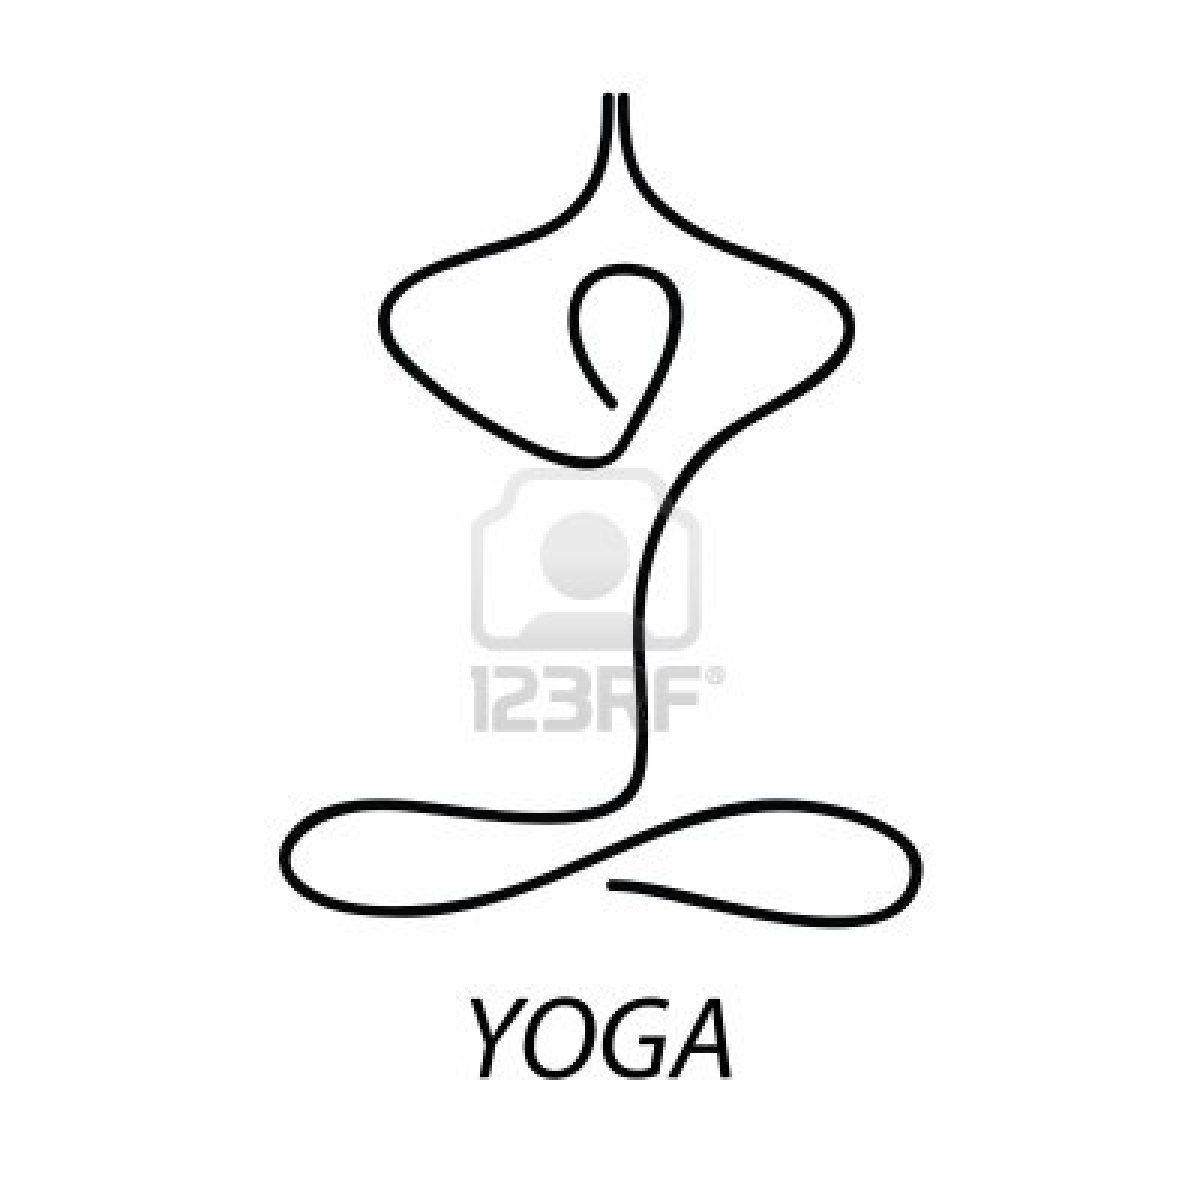 Yoga Sign Symbol The Lotus Posture Meditation Relax Crafts